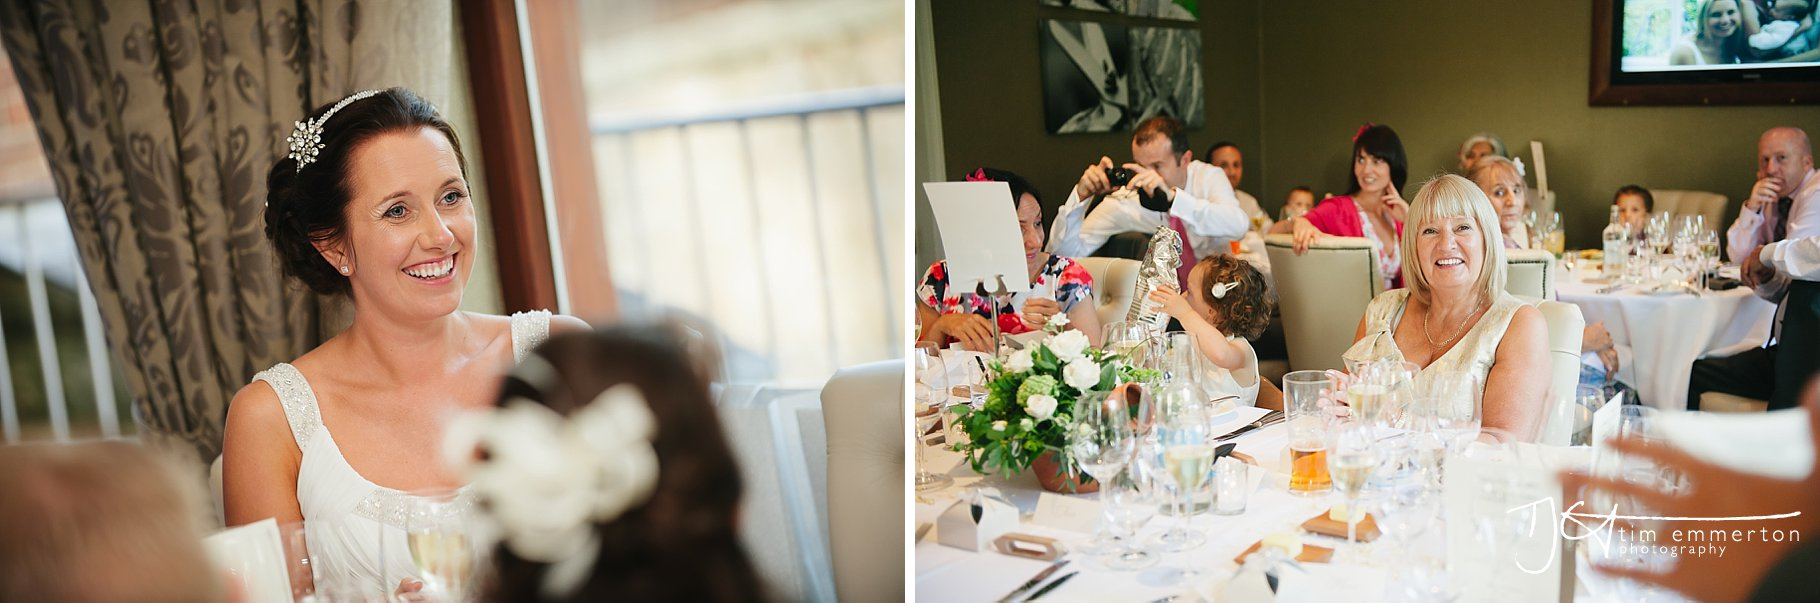 Northcote-Wedding-Photos-358.jpg